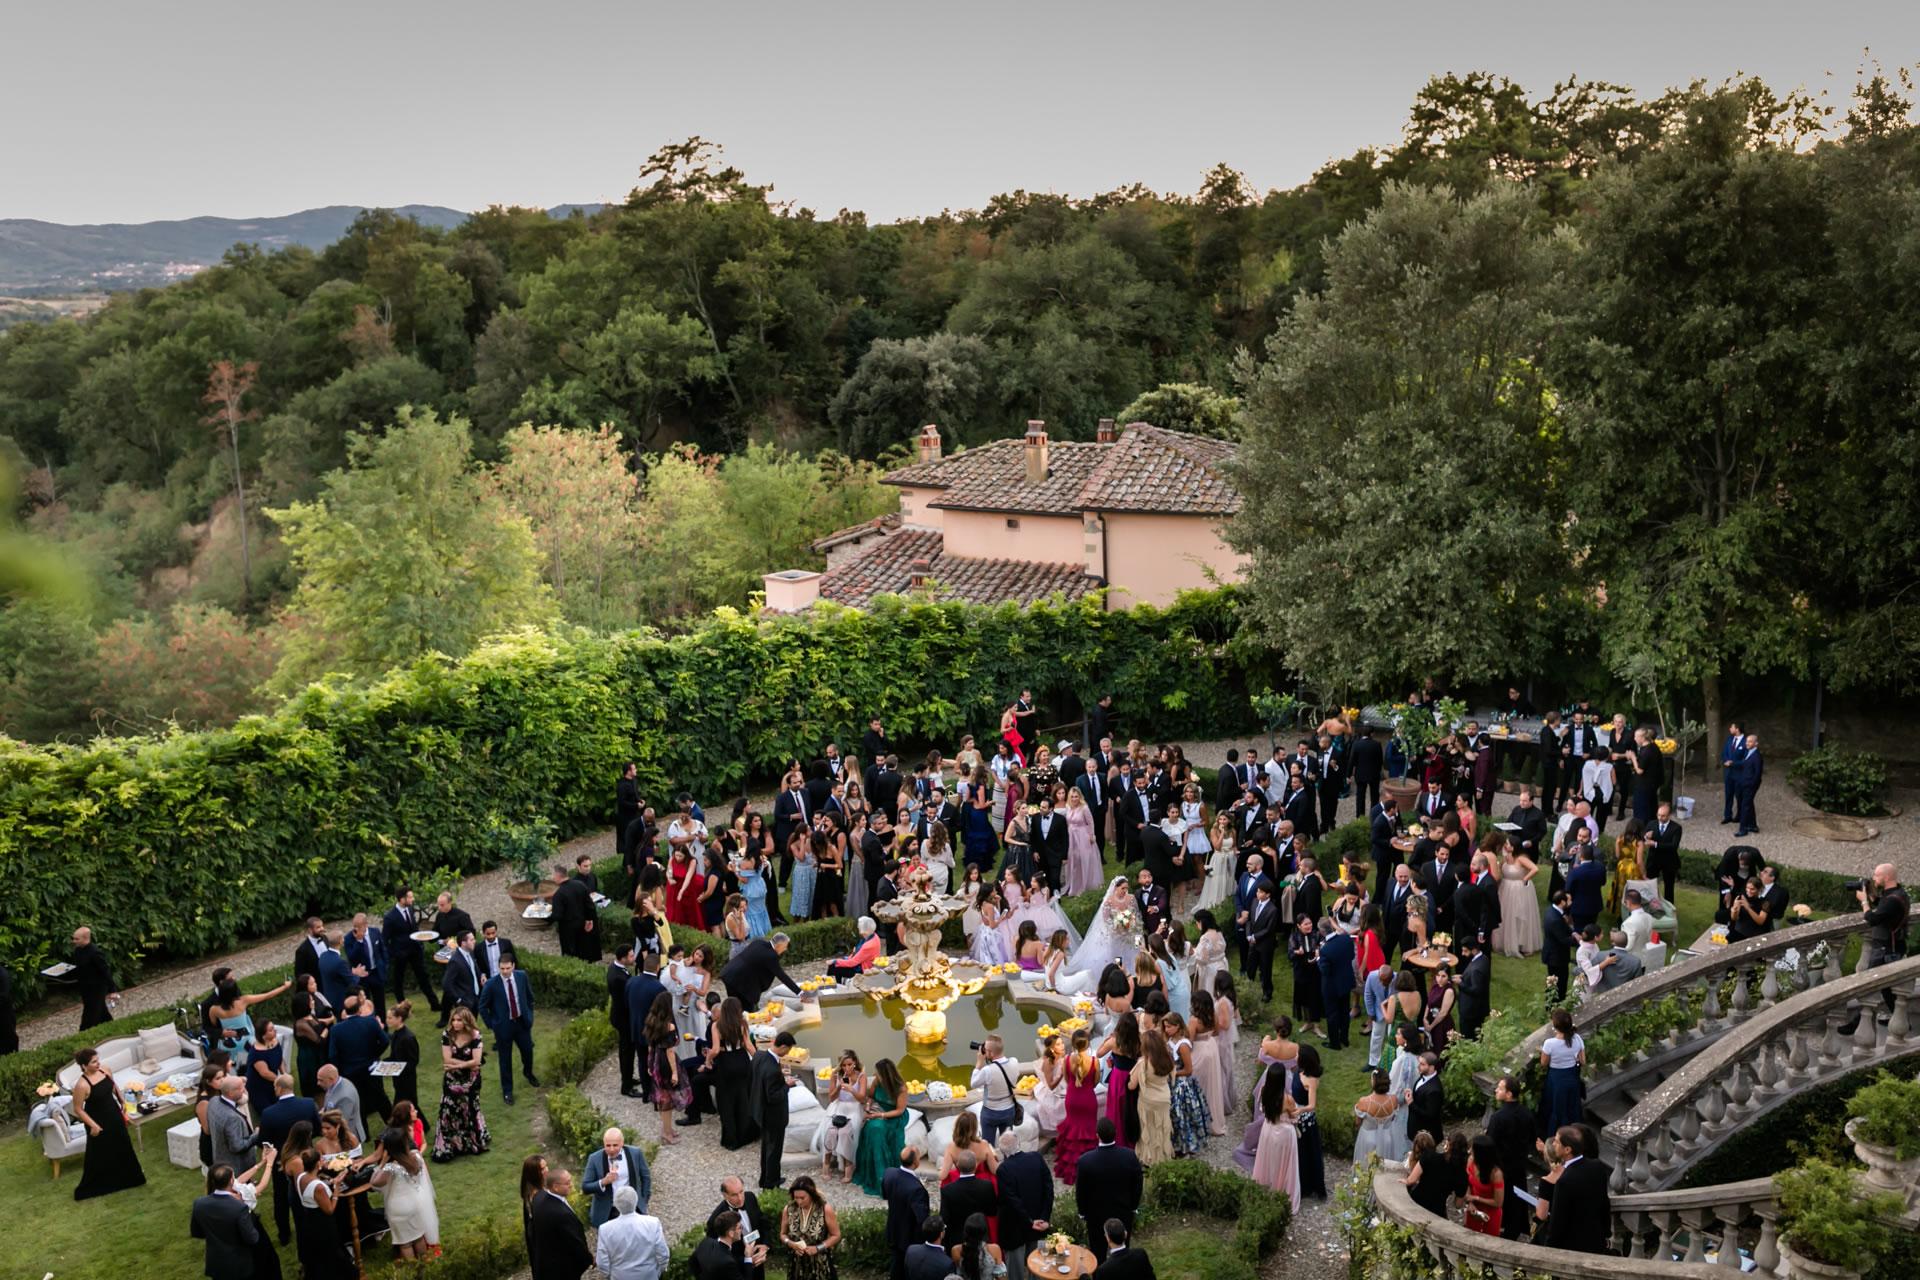 Court - 34 :: Luxury wedding at Il Borro :: Luxury wedding photography - 33 :: Court - 34